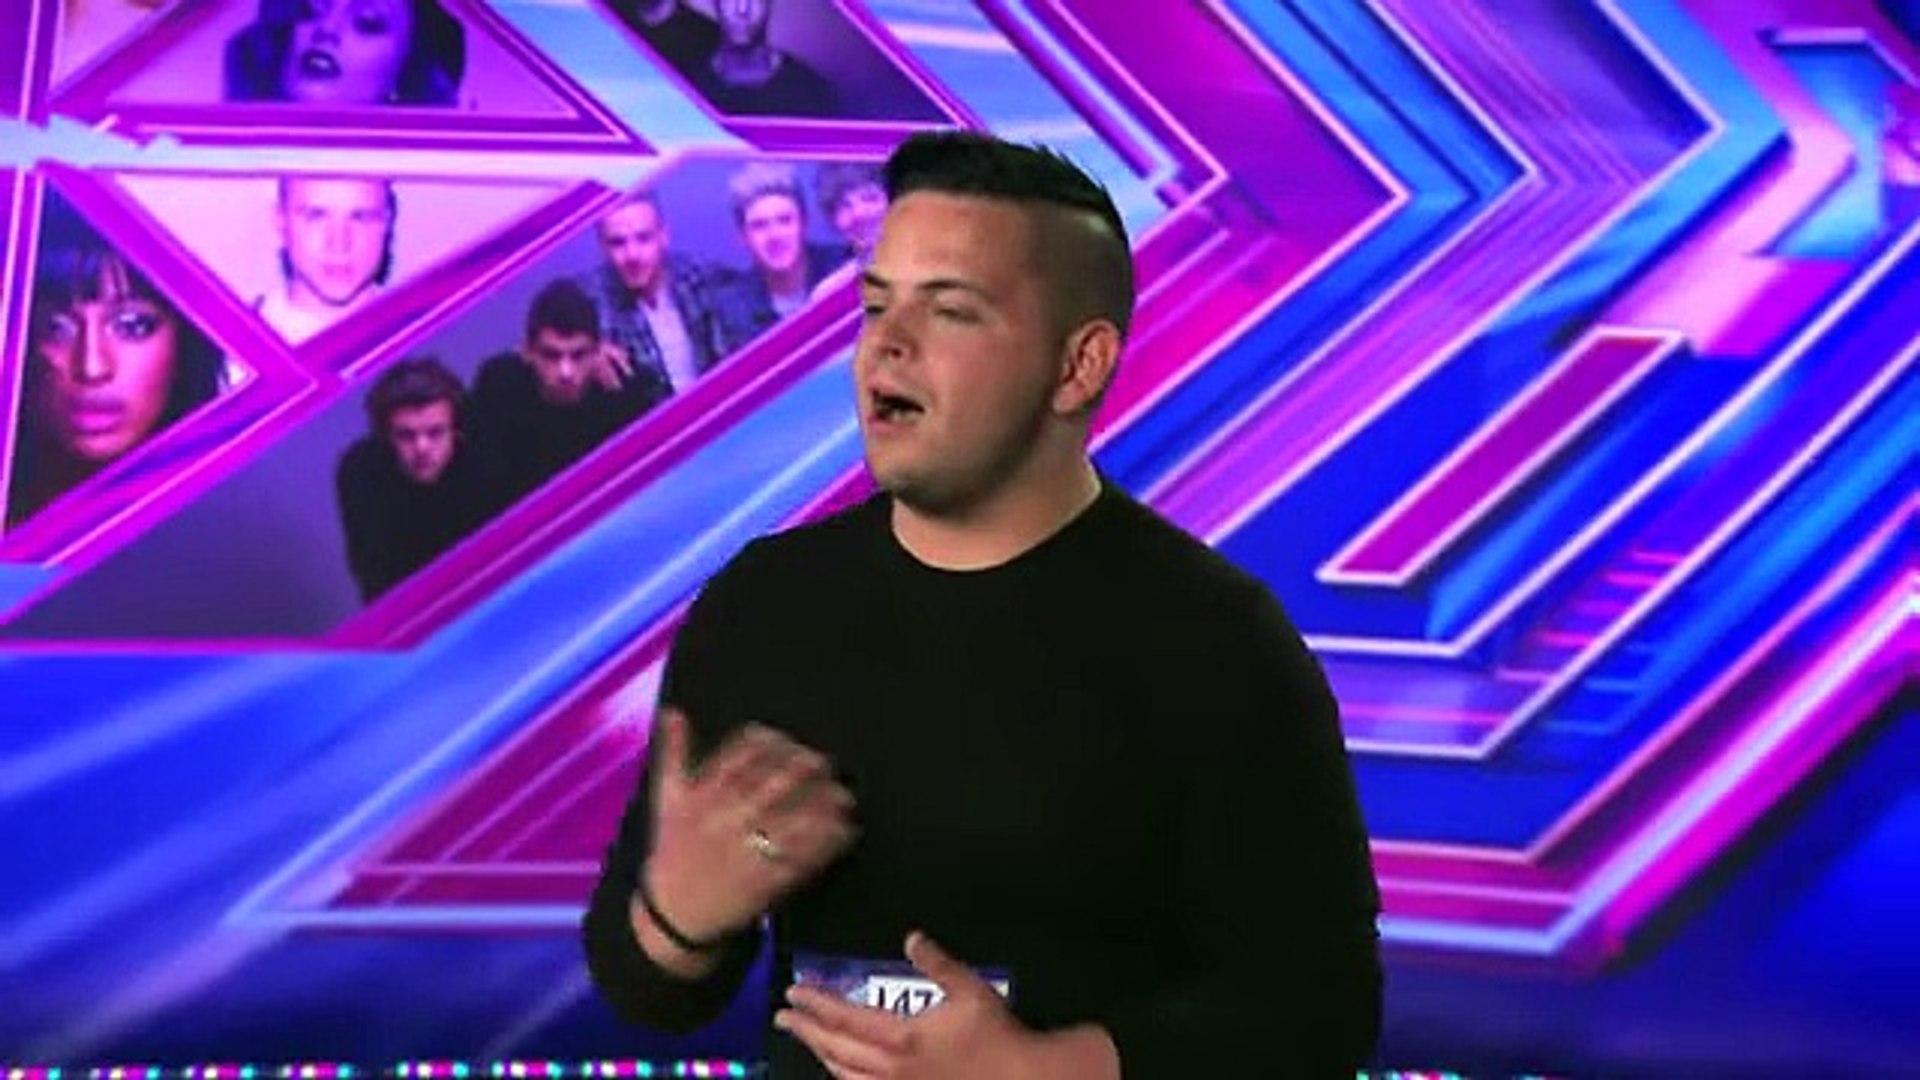 Paul Akister sings Jealous Guy by John Lennon - Room Auditions Week 2 - The X Factor UK 2014 -Offici